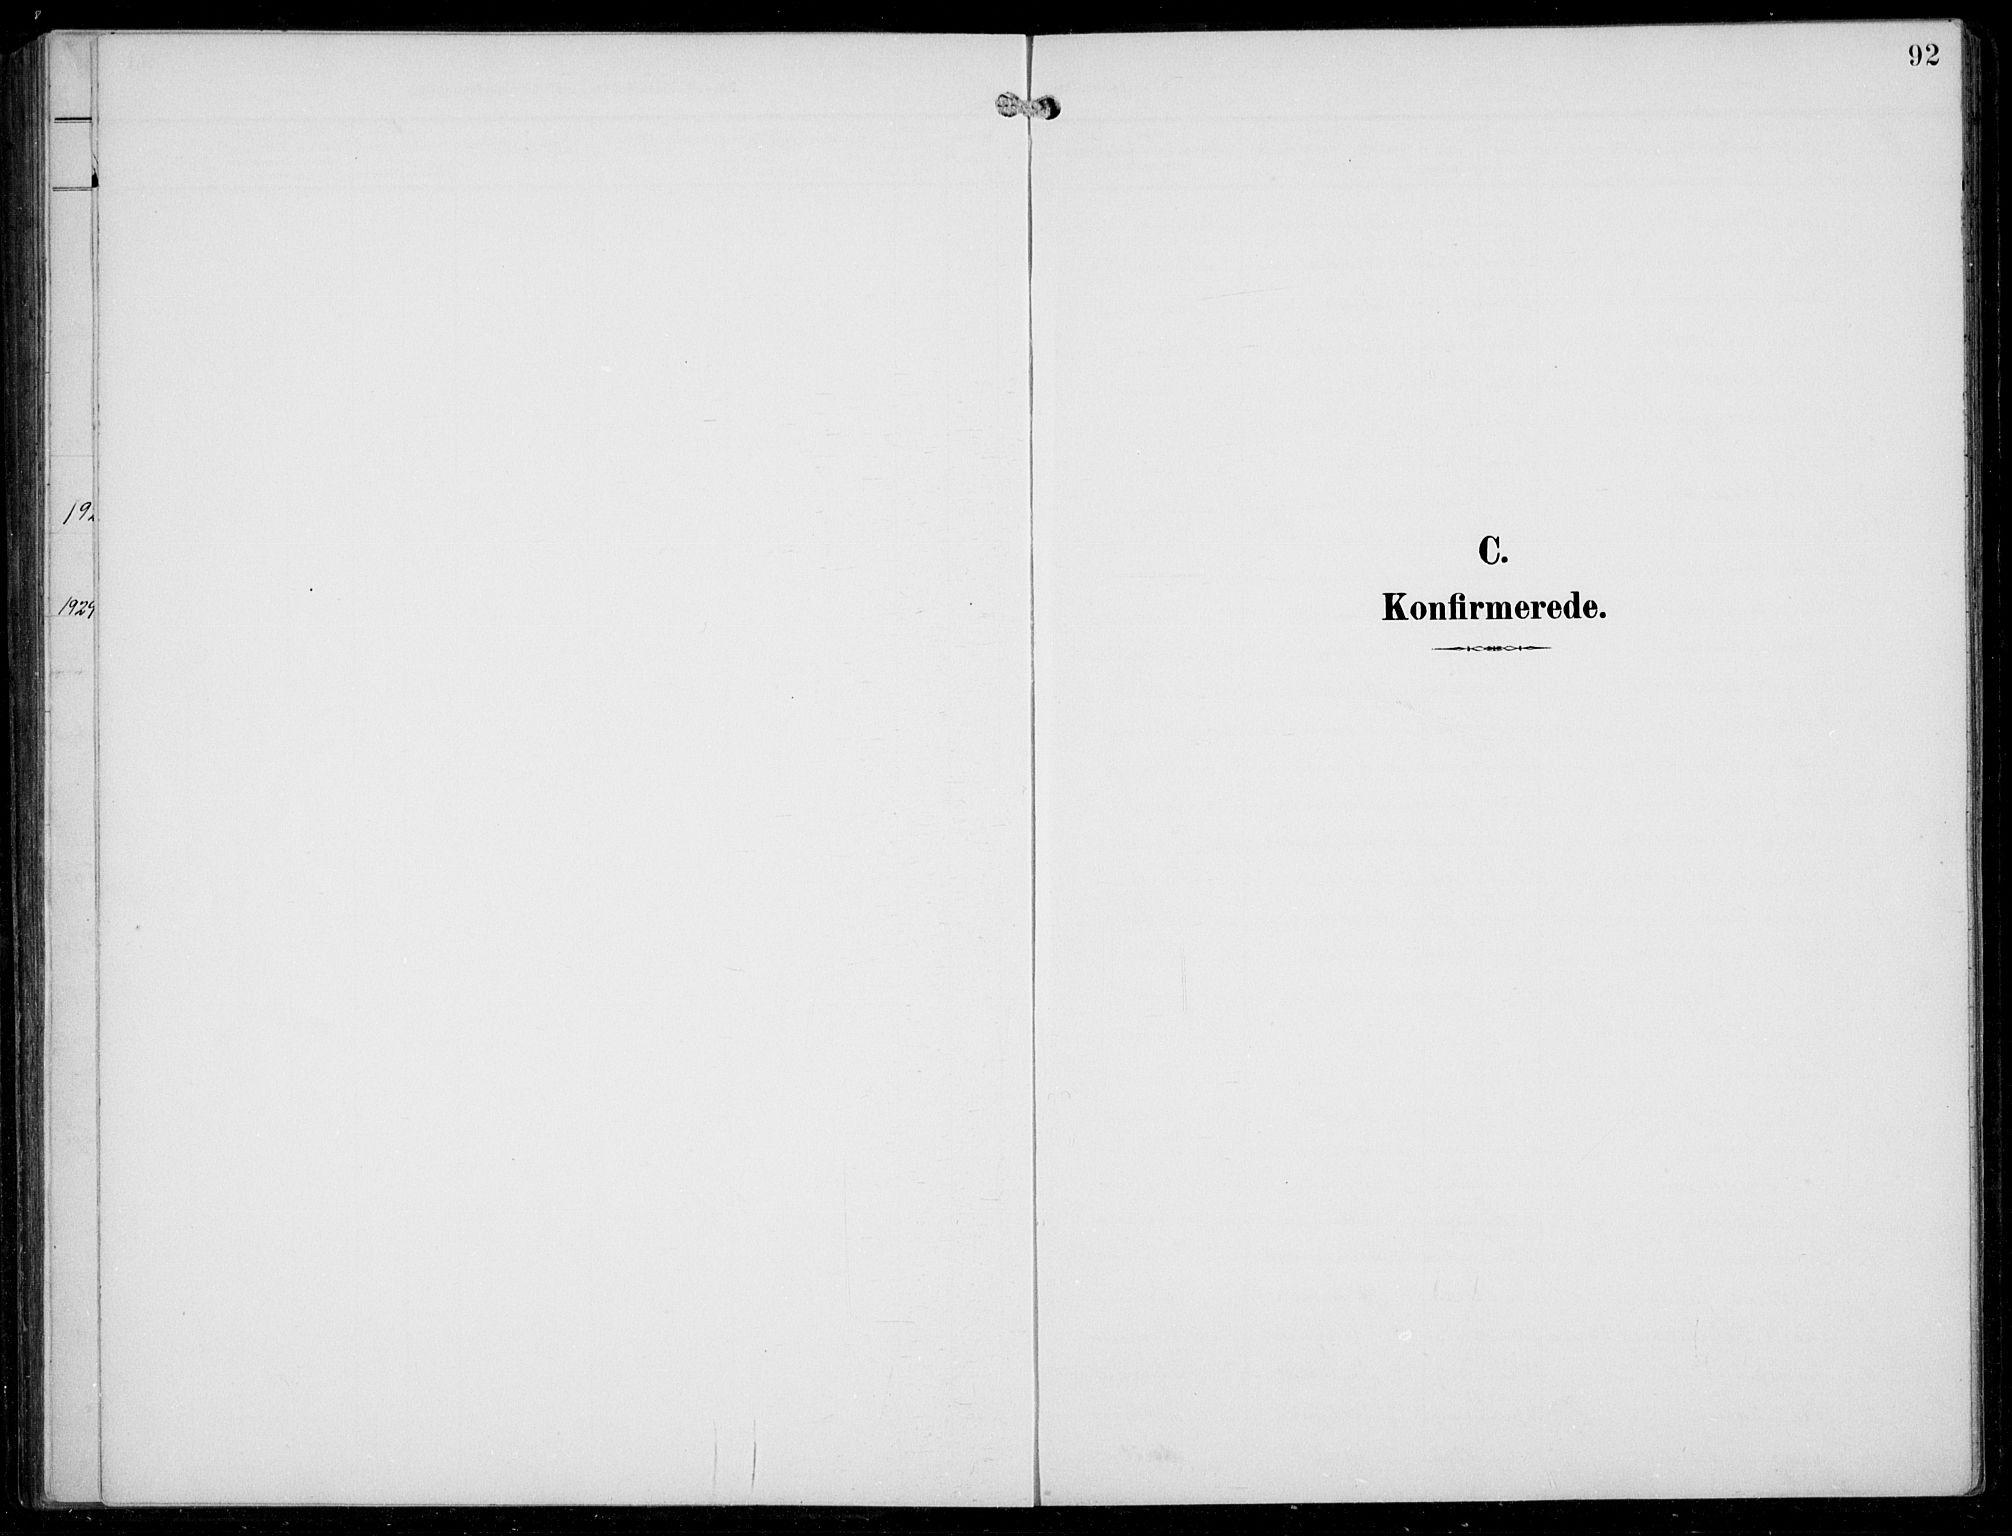 SAB, Aurland sokneprestembete, H/Hb/Hba/L0003: Klokkerbok nr. A 3, 1896-1939, s. 92